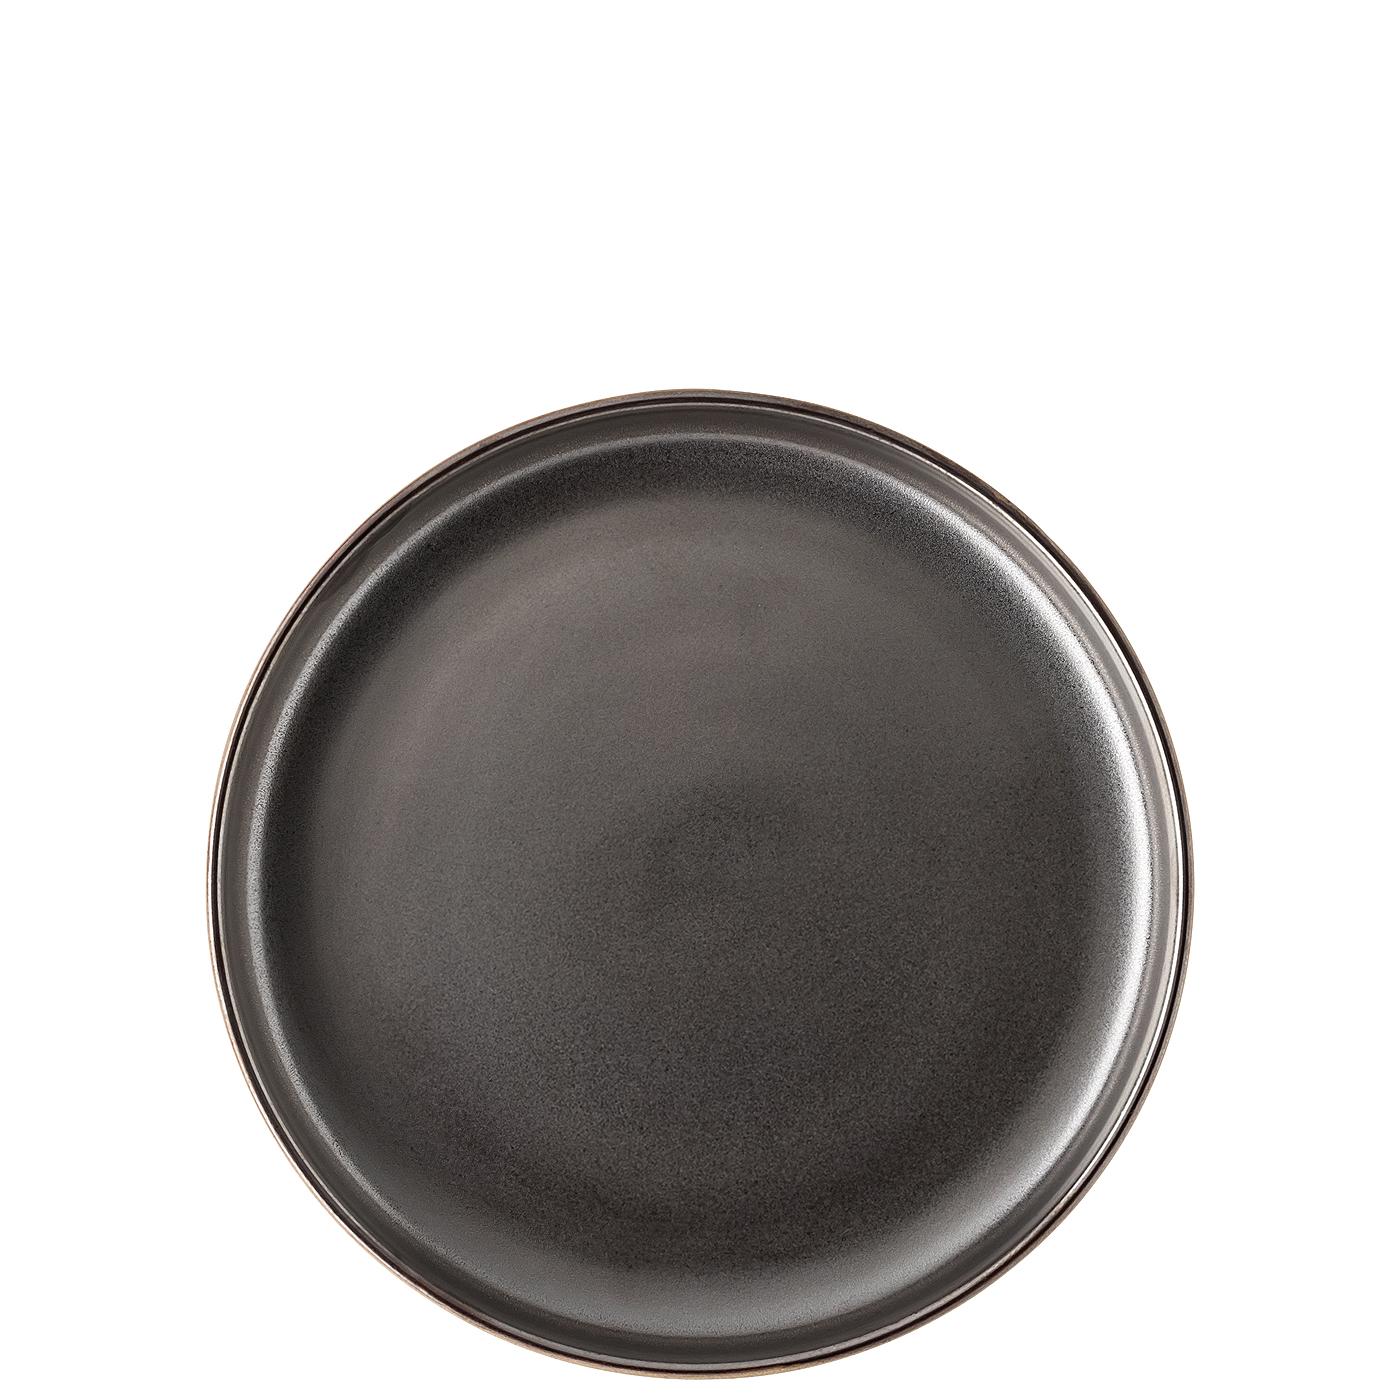 Gourmetteller 24 cm Joyn Stoneware Iron Arzberg